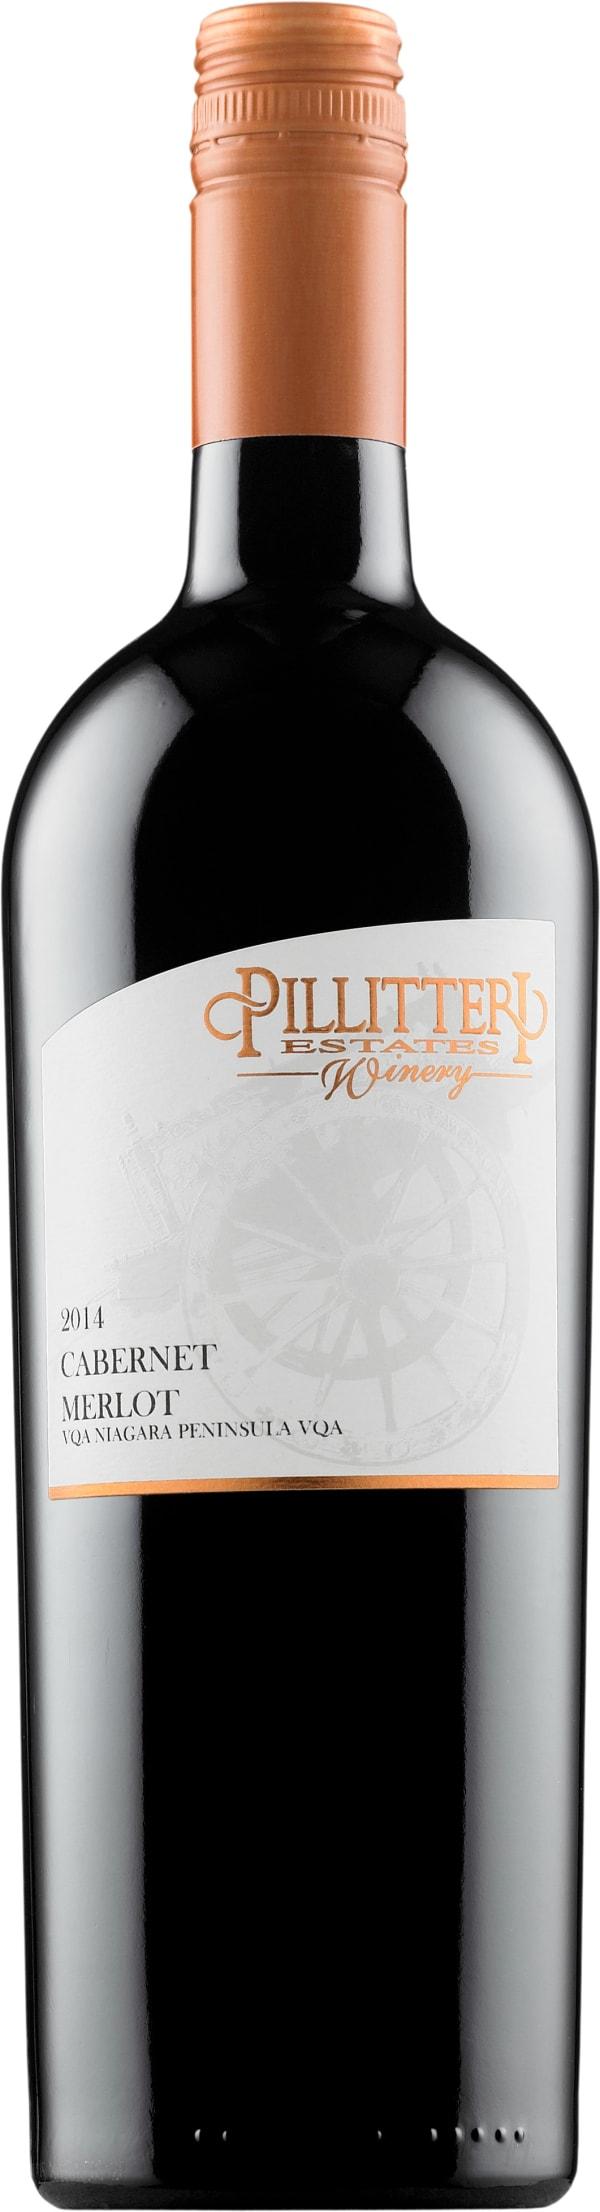 Pillitteri Cabernet Merlot 2015